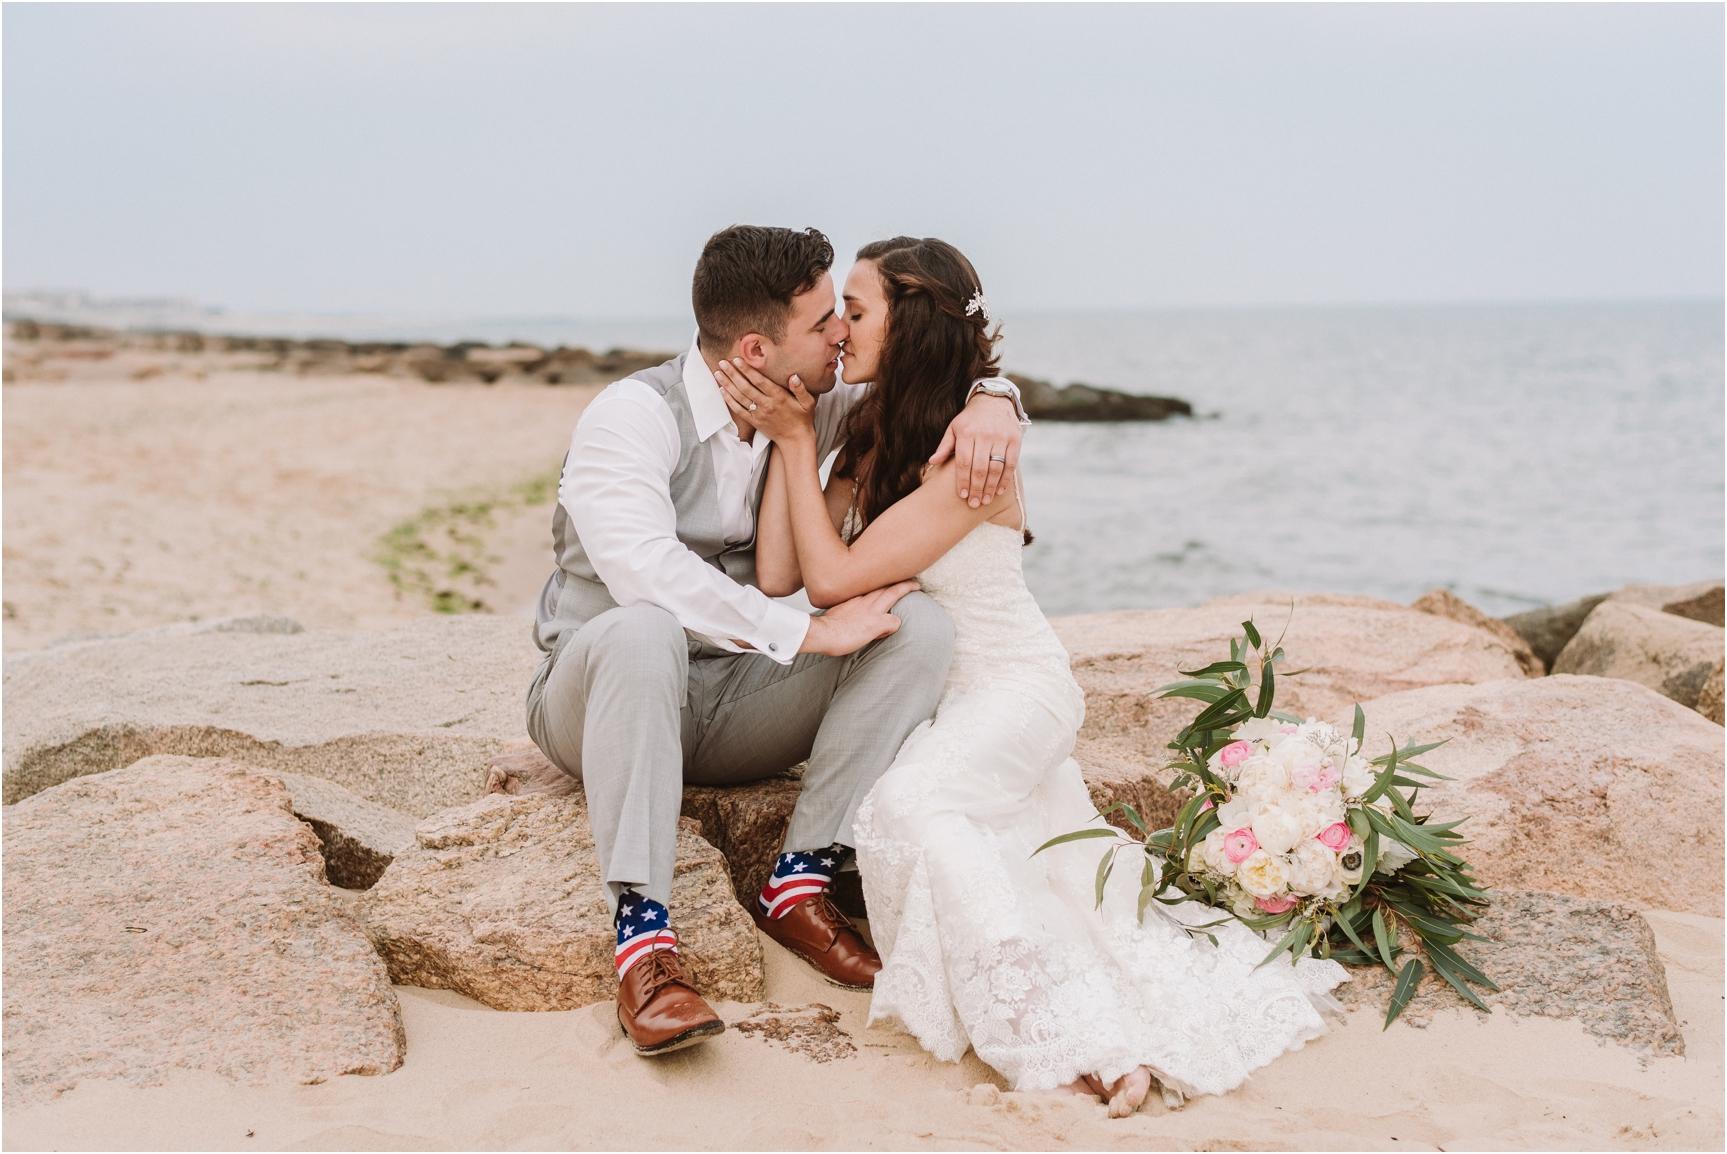 Sarah & Sam Pelham House Cape Cod Wedding Photographer-205.jpg